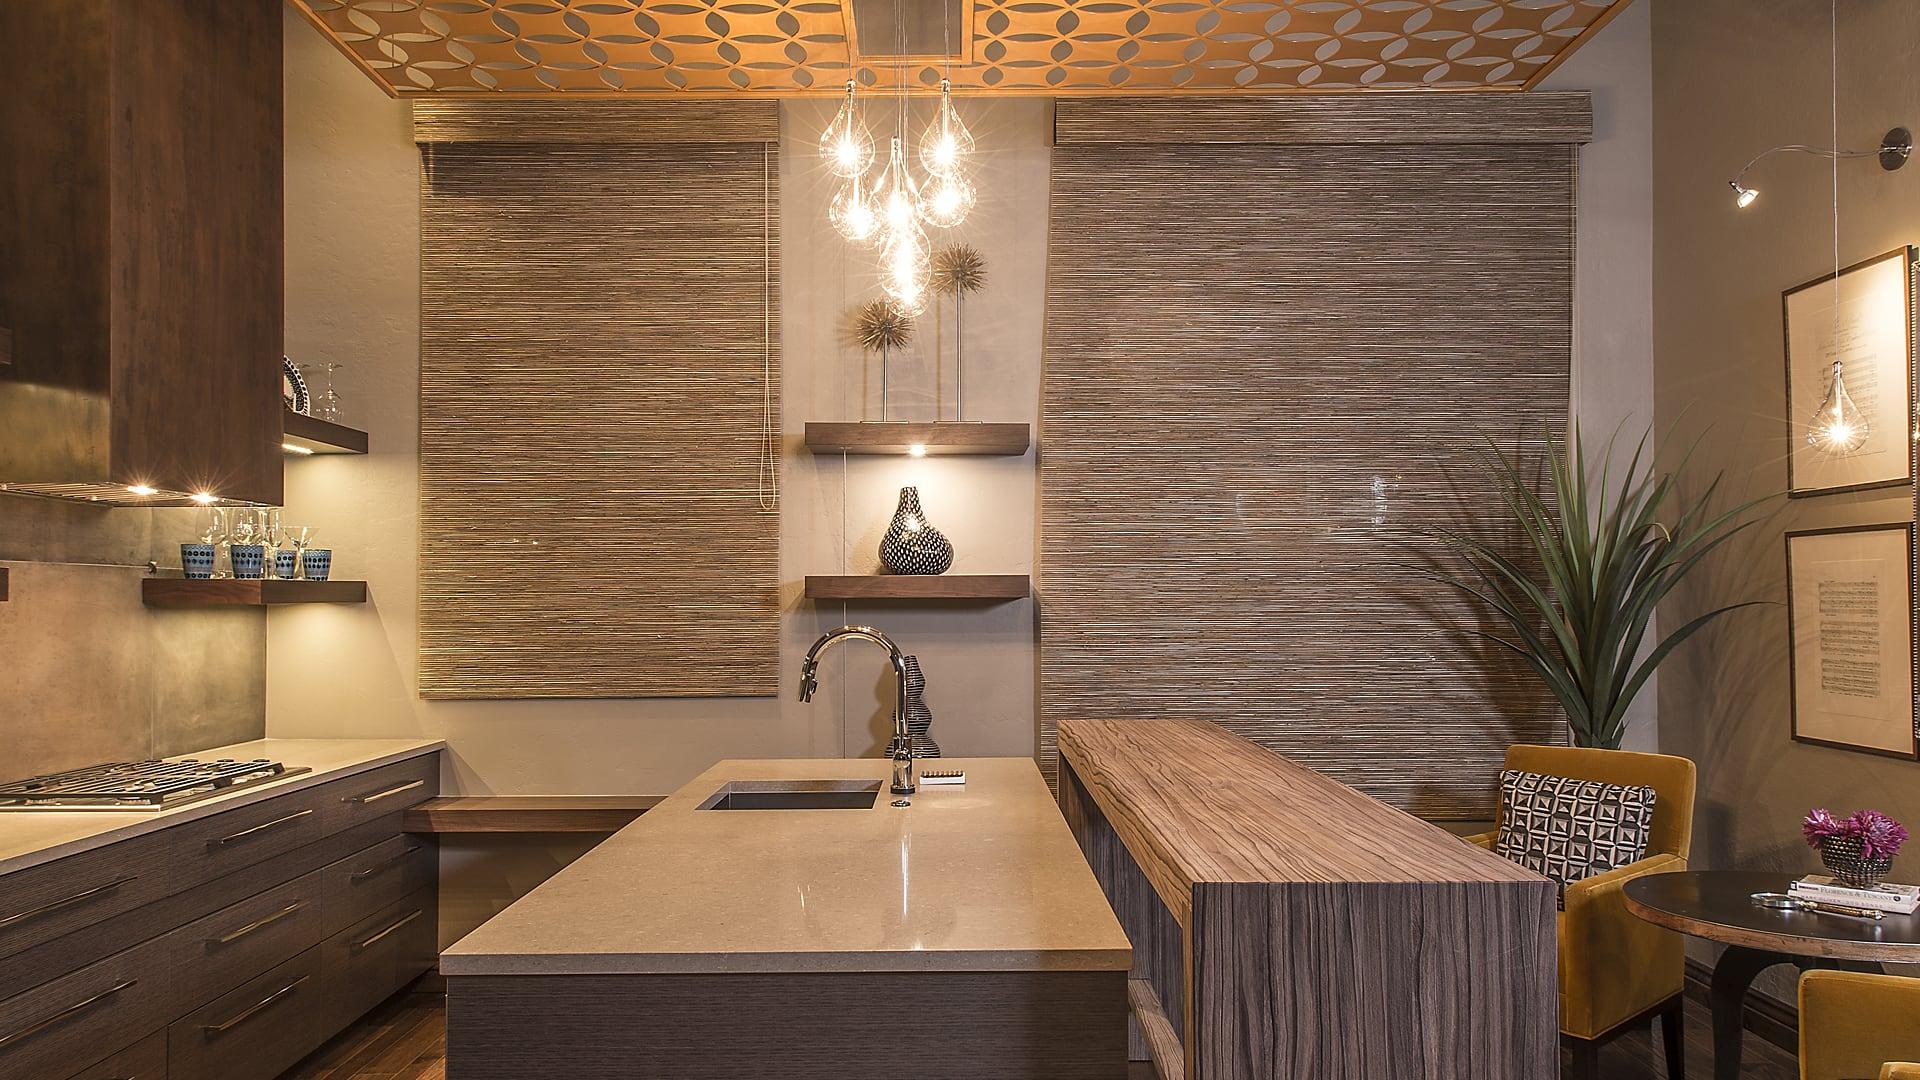 Kitchen Cabinets Custom Designs Remodeling Tucson Arizona